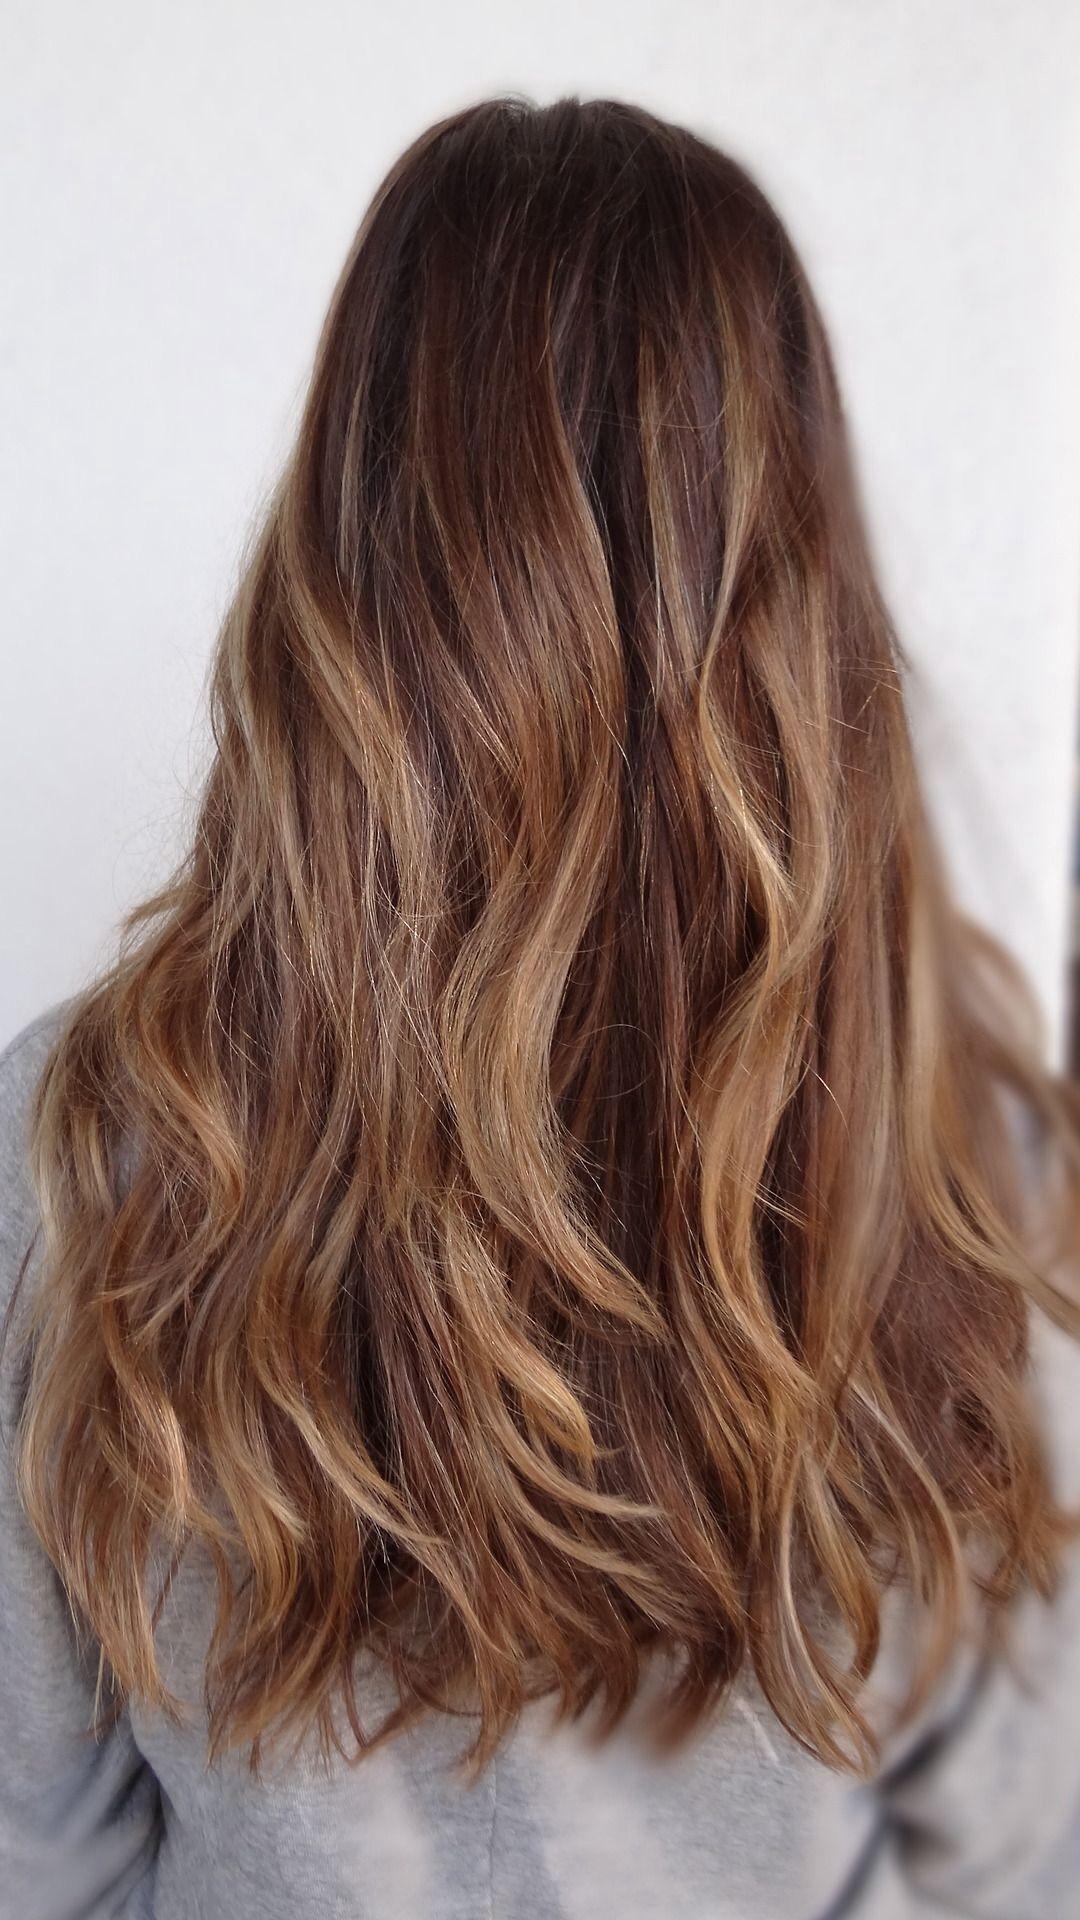 This Is Definitely Happening Tomorrow Hair Pinterest Kolay Saç